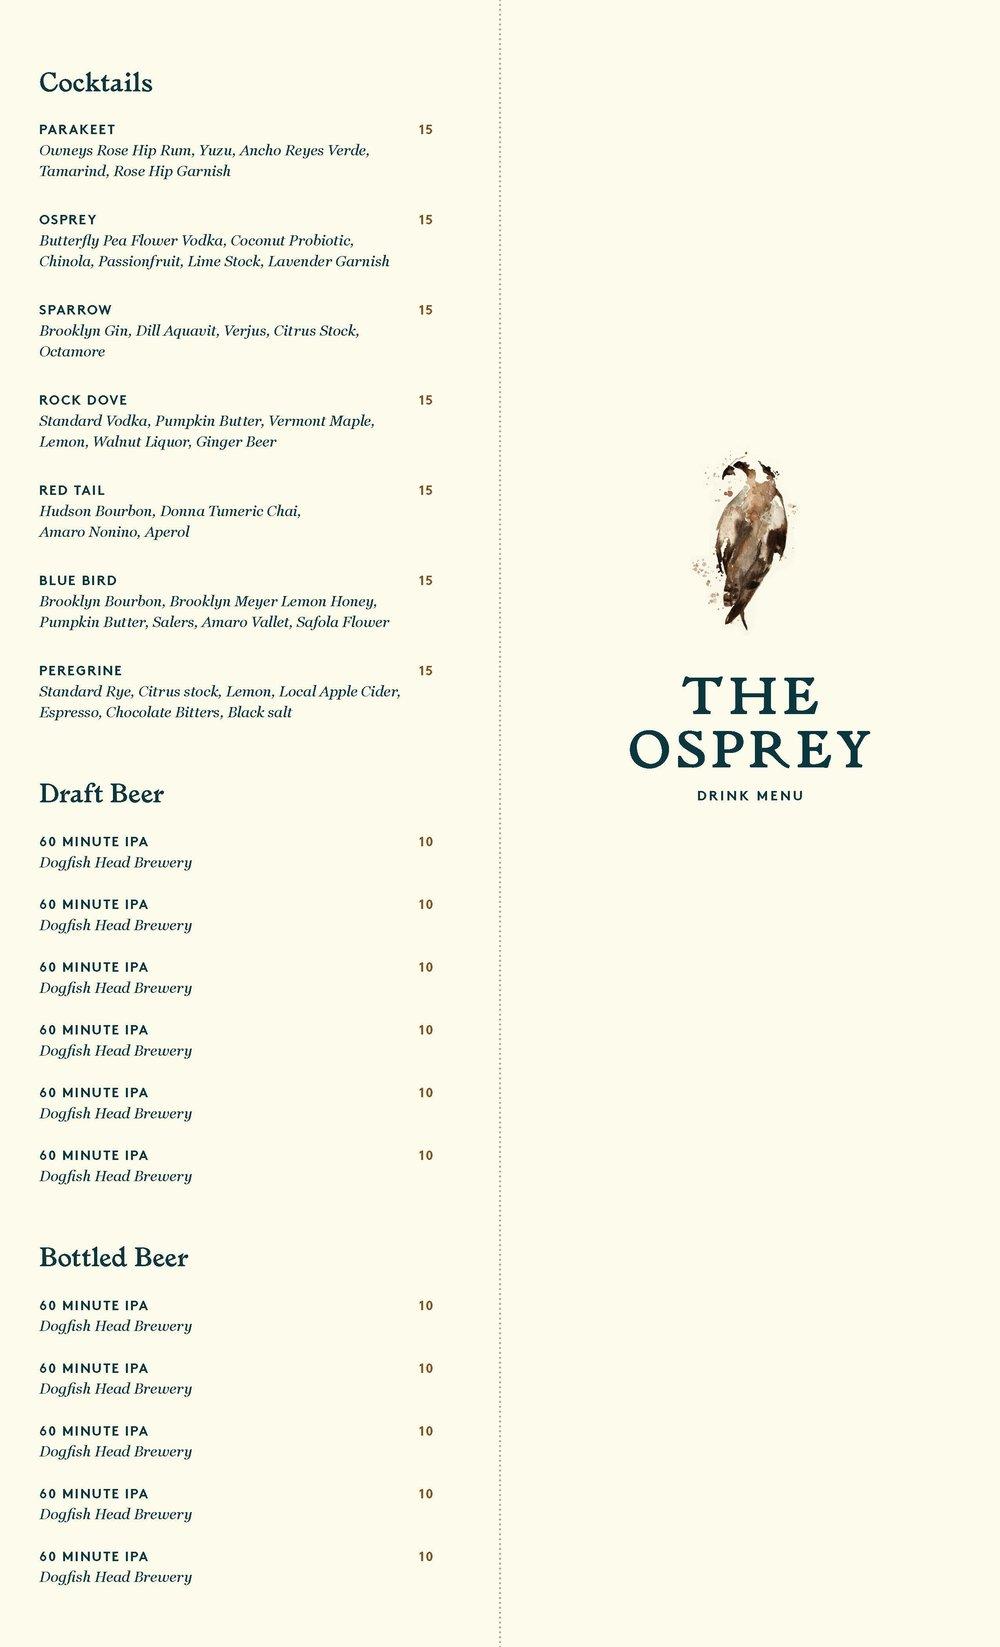 Osprey_DrinkMenu2_Page_1.jpg